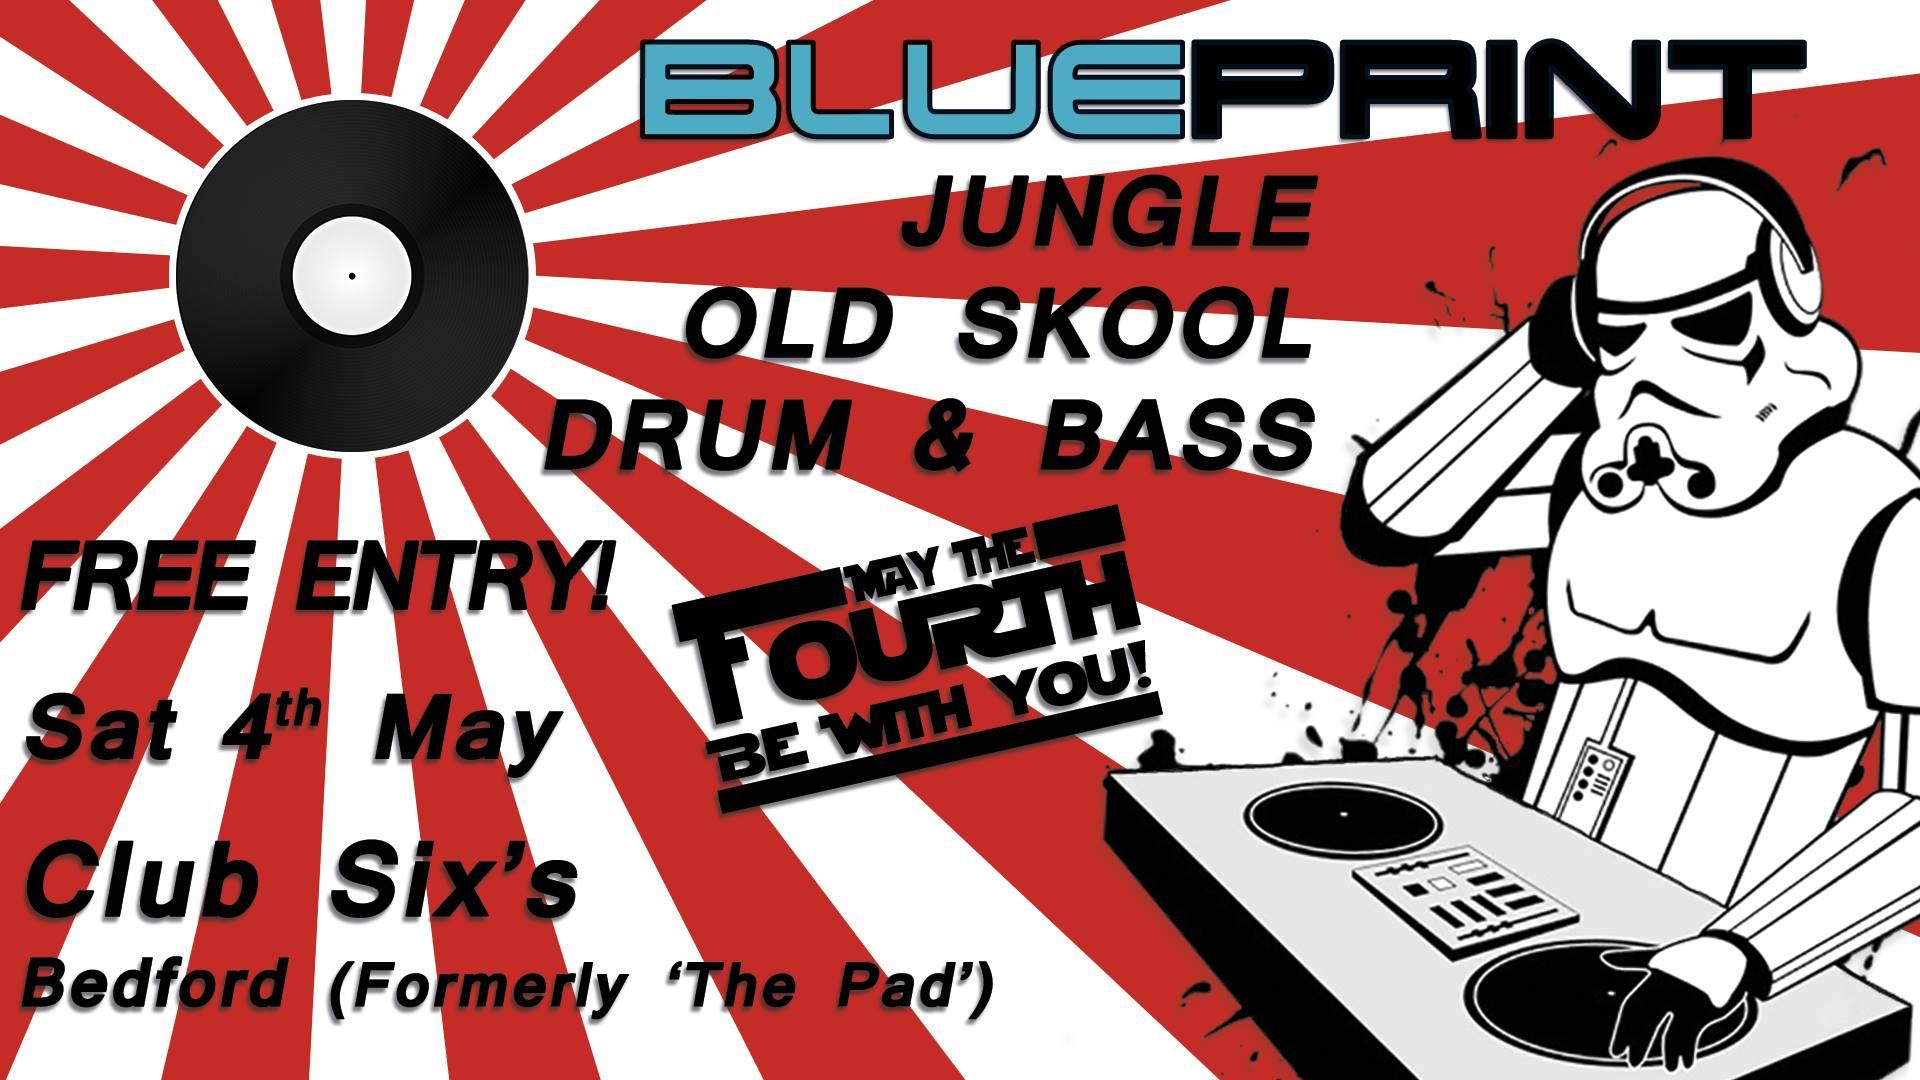 Blueprint present: Best of Bedford (Old Skool/Jungle/dnb) at Club Six's